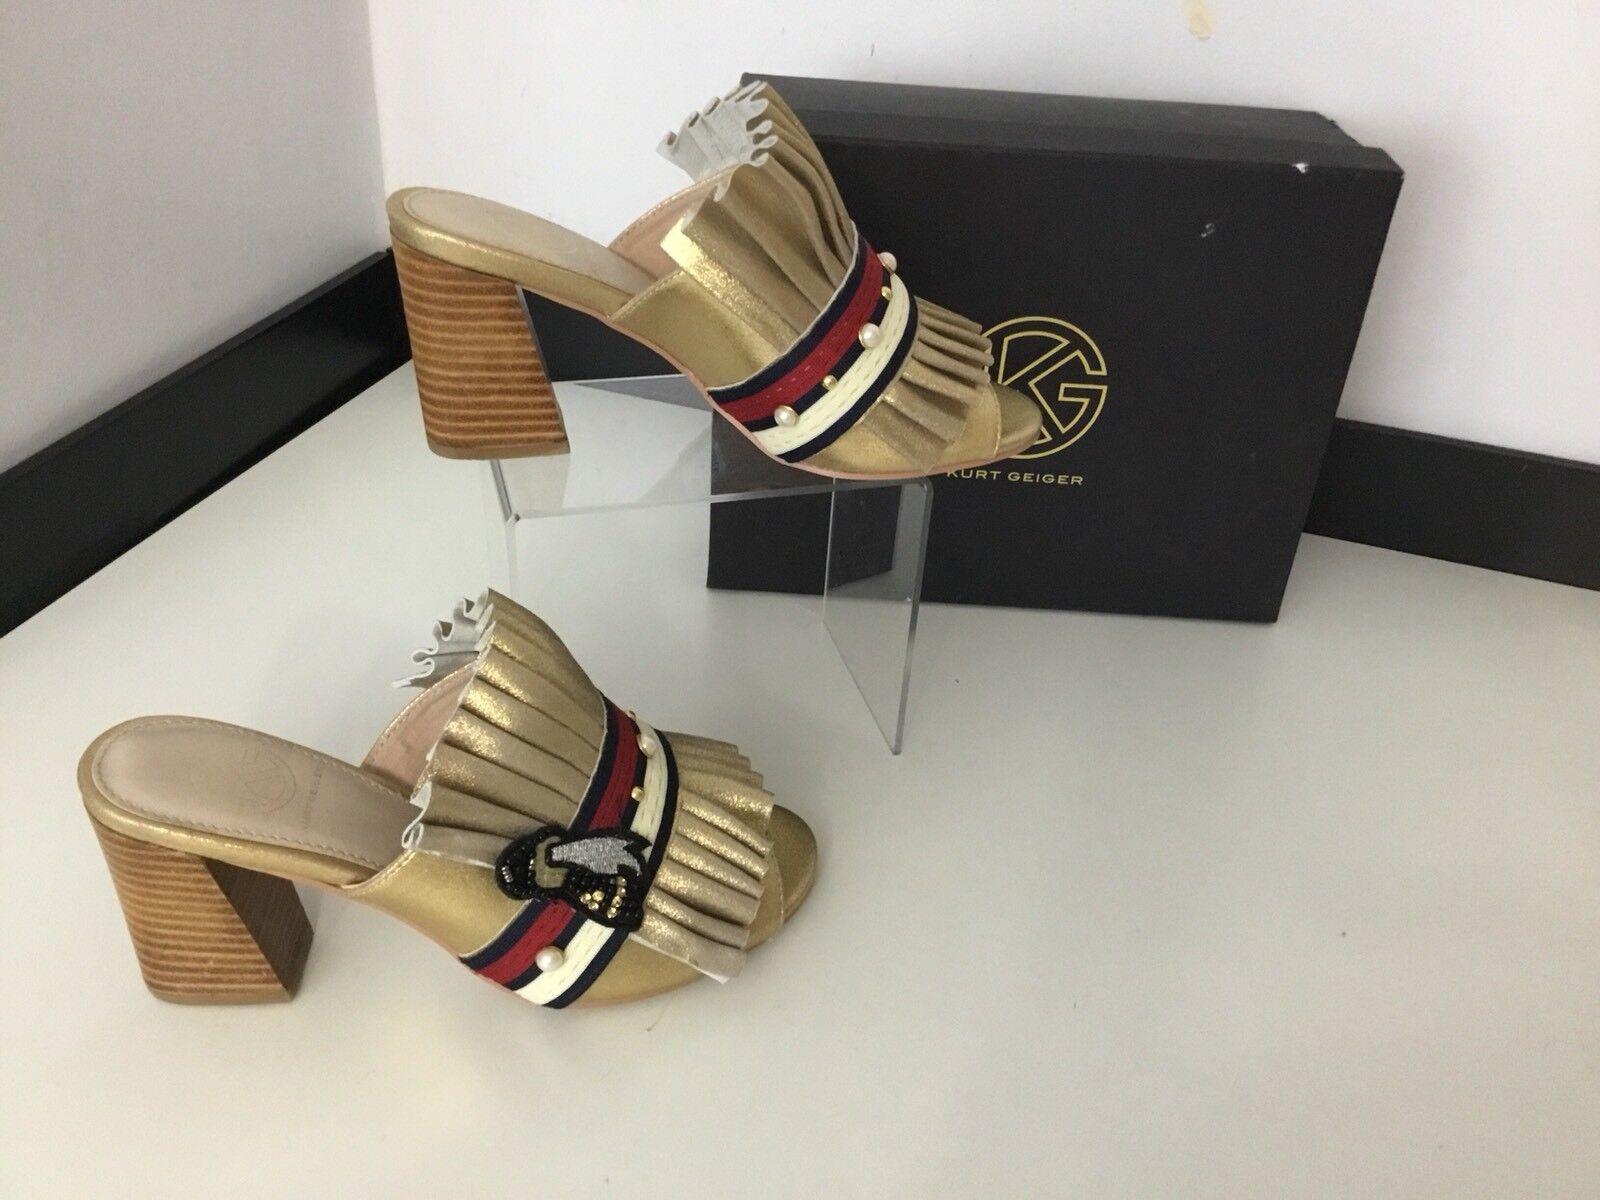 Kurt Geiger Kyfer Ladies Mules, Uk 4 Eu37, gold Fridged. New, Bnwob shoes